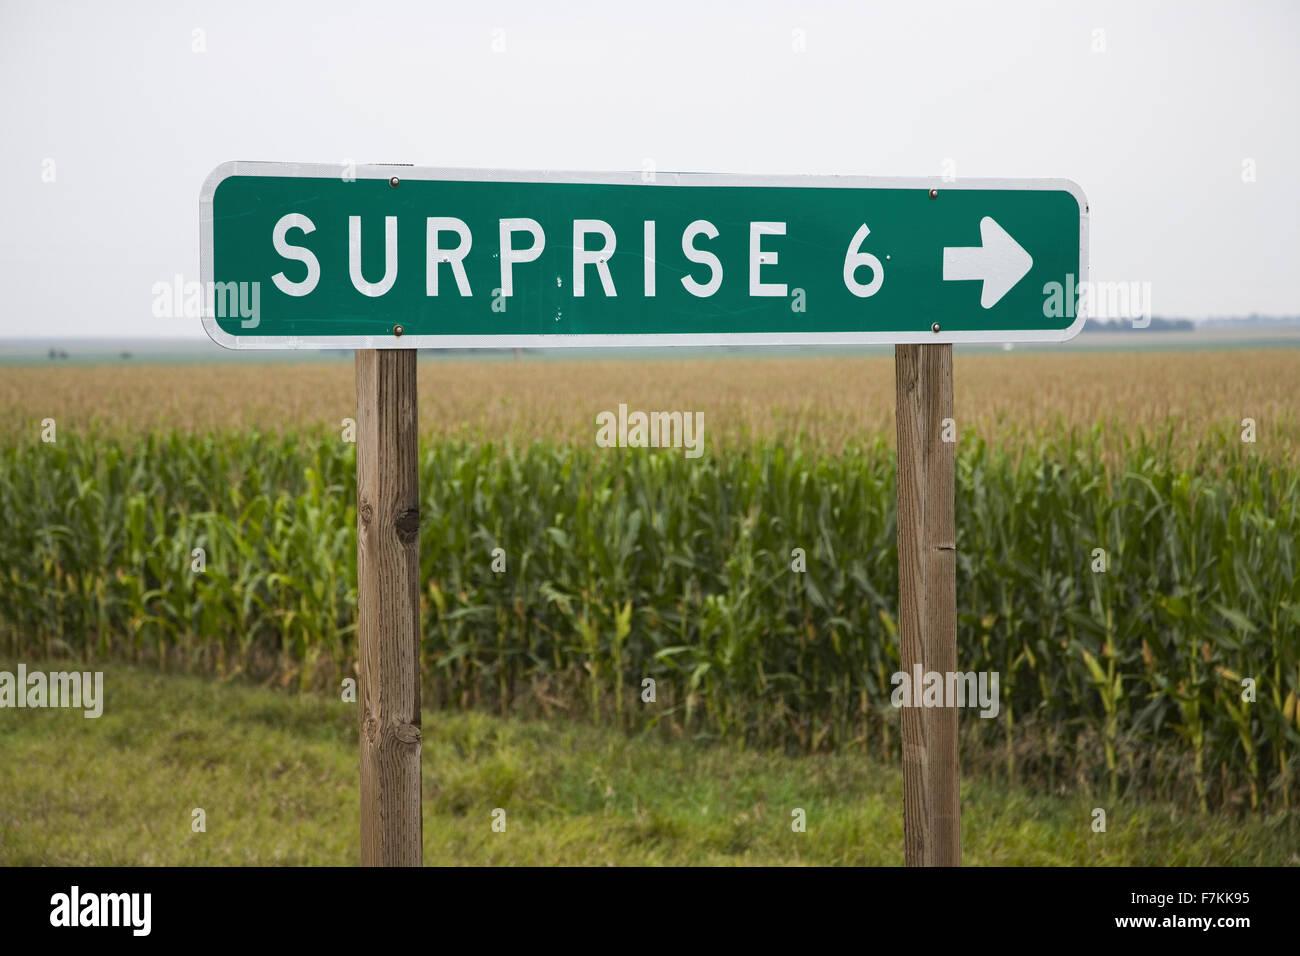 Road sign pointing to Surprise, Nebraska Stock Photo